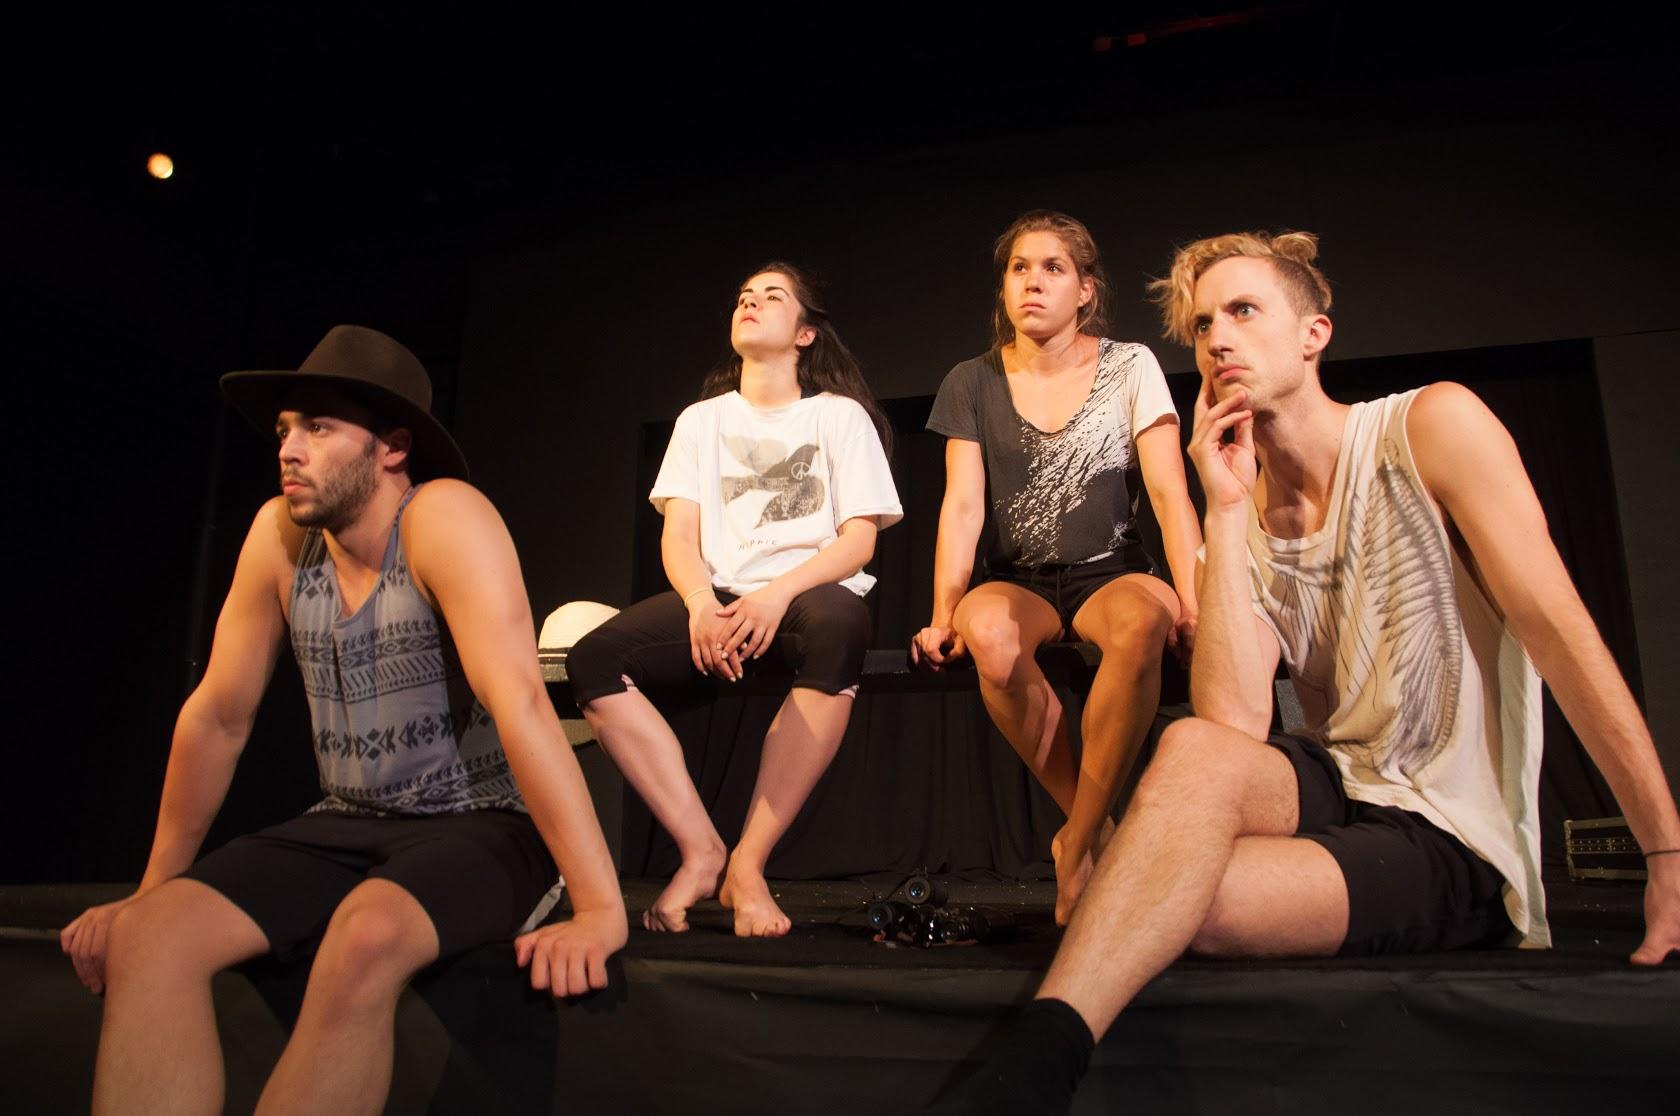 LubDub. Theatre:  Geoff Kanick, Caitlin Cassidy, Skye Van Rensselaer, Clinton Edward  photo by Kyler Ross